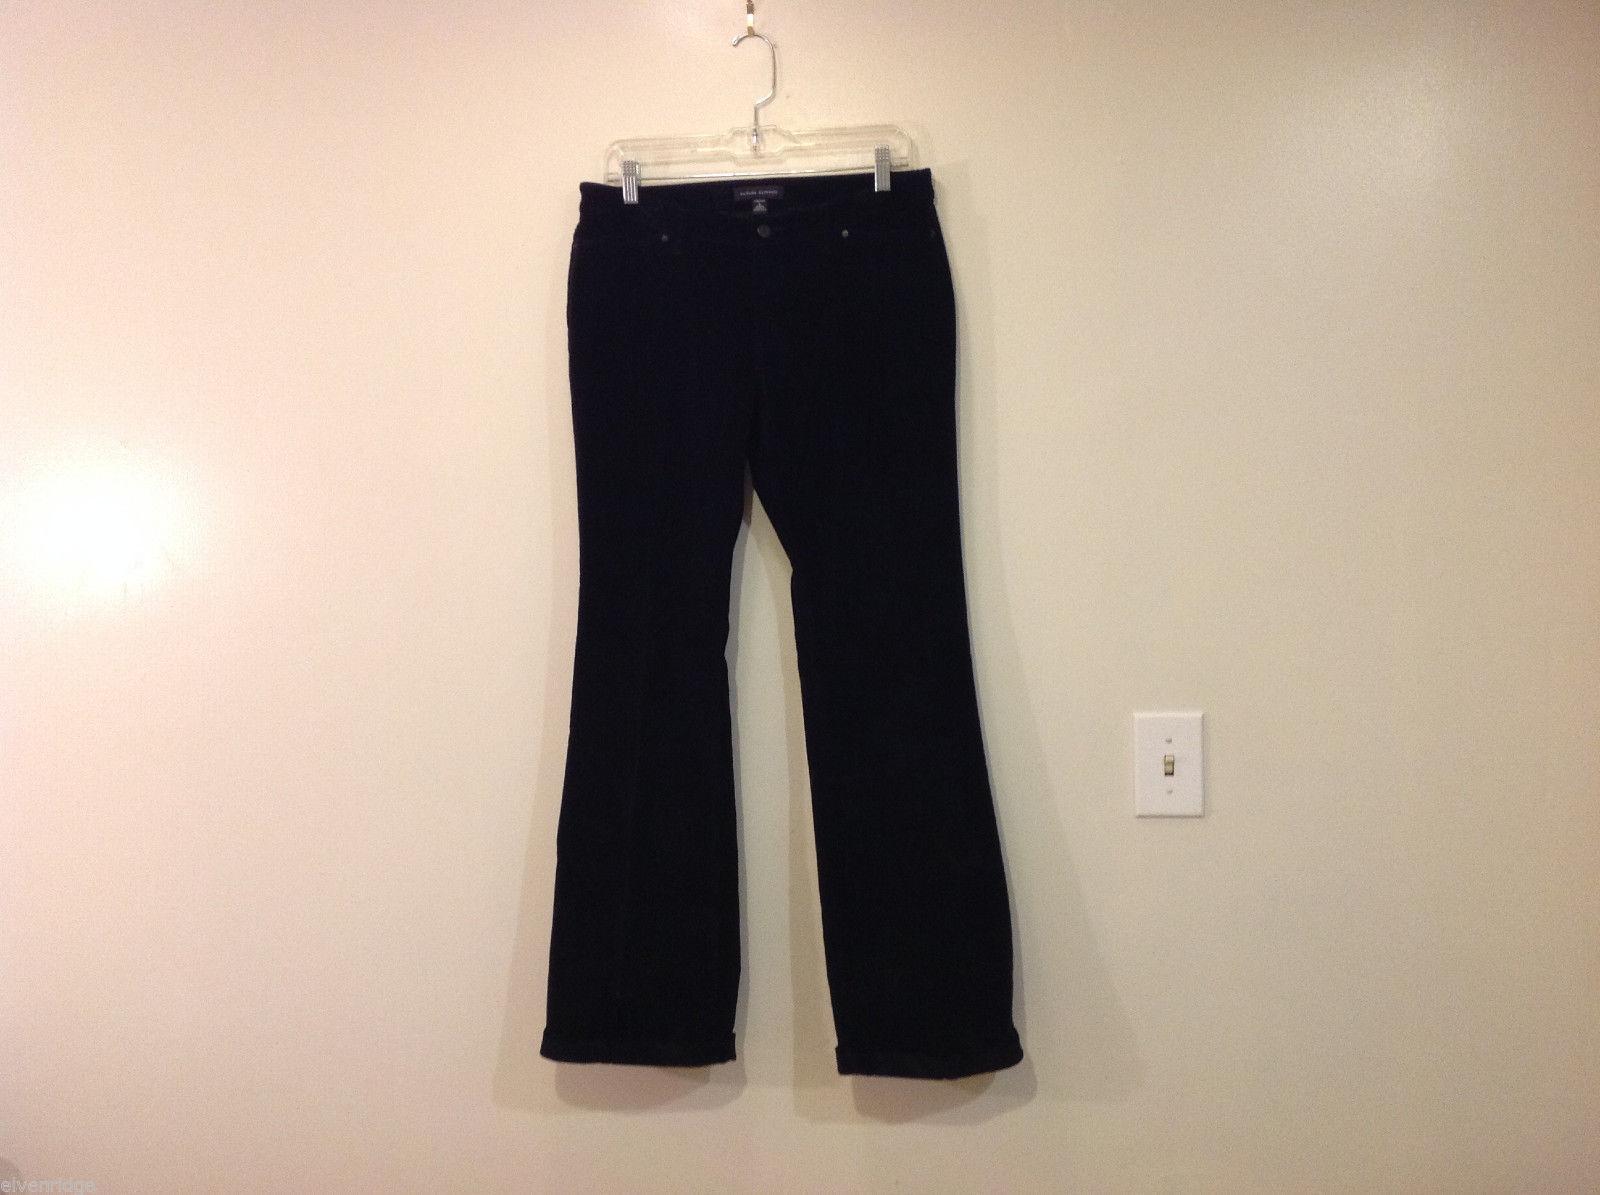 Banana Republic Black Velvet Stretch Pants with Pockets, Size 6